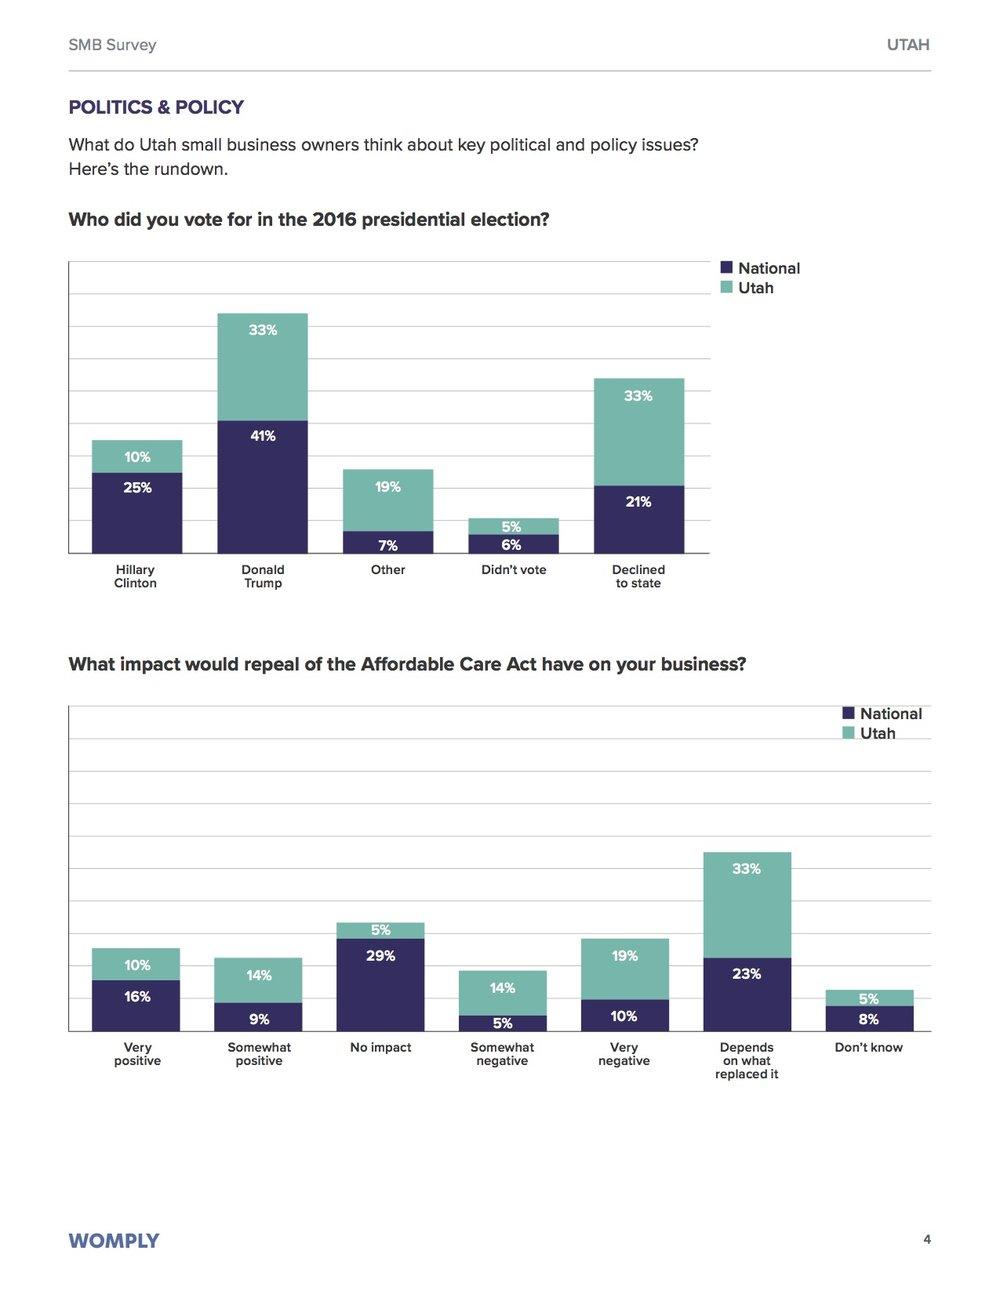 utah-small-business-survey-2017-4